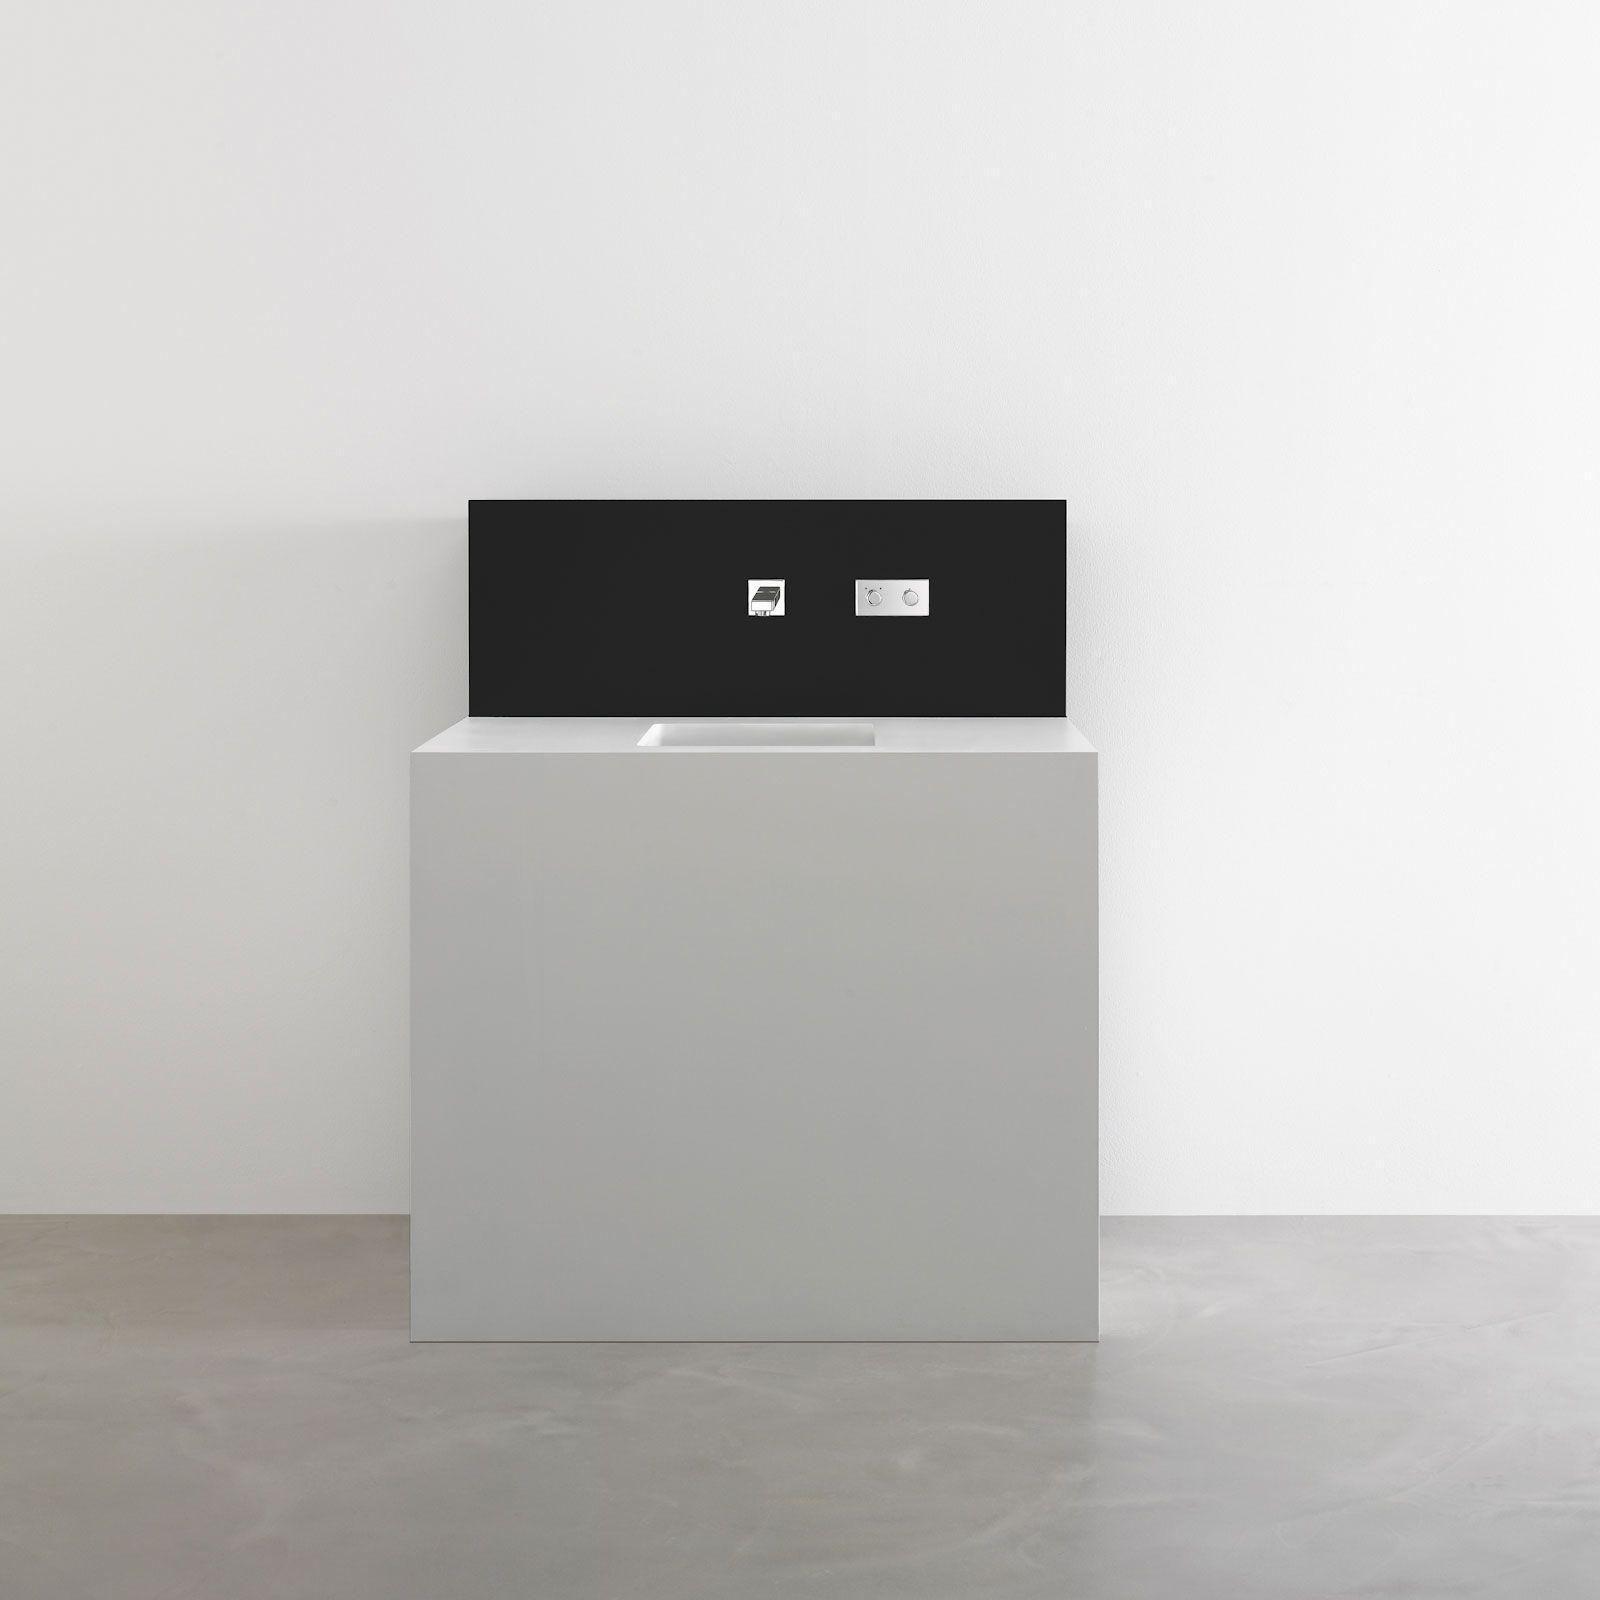 sple armatur perfect ikea wasserhahn sple wasserkran wasserhahn ikea with kche wasserhahn with. Black Bedroom Furniture Sets. Home Design Ideas